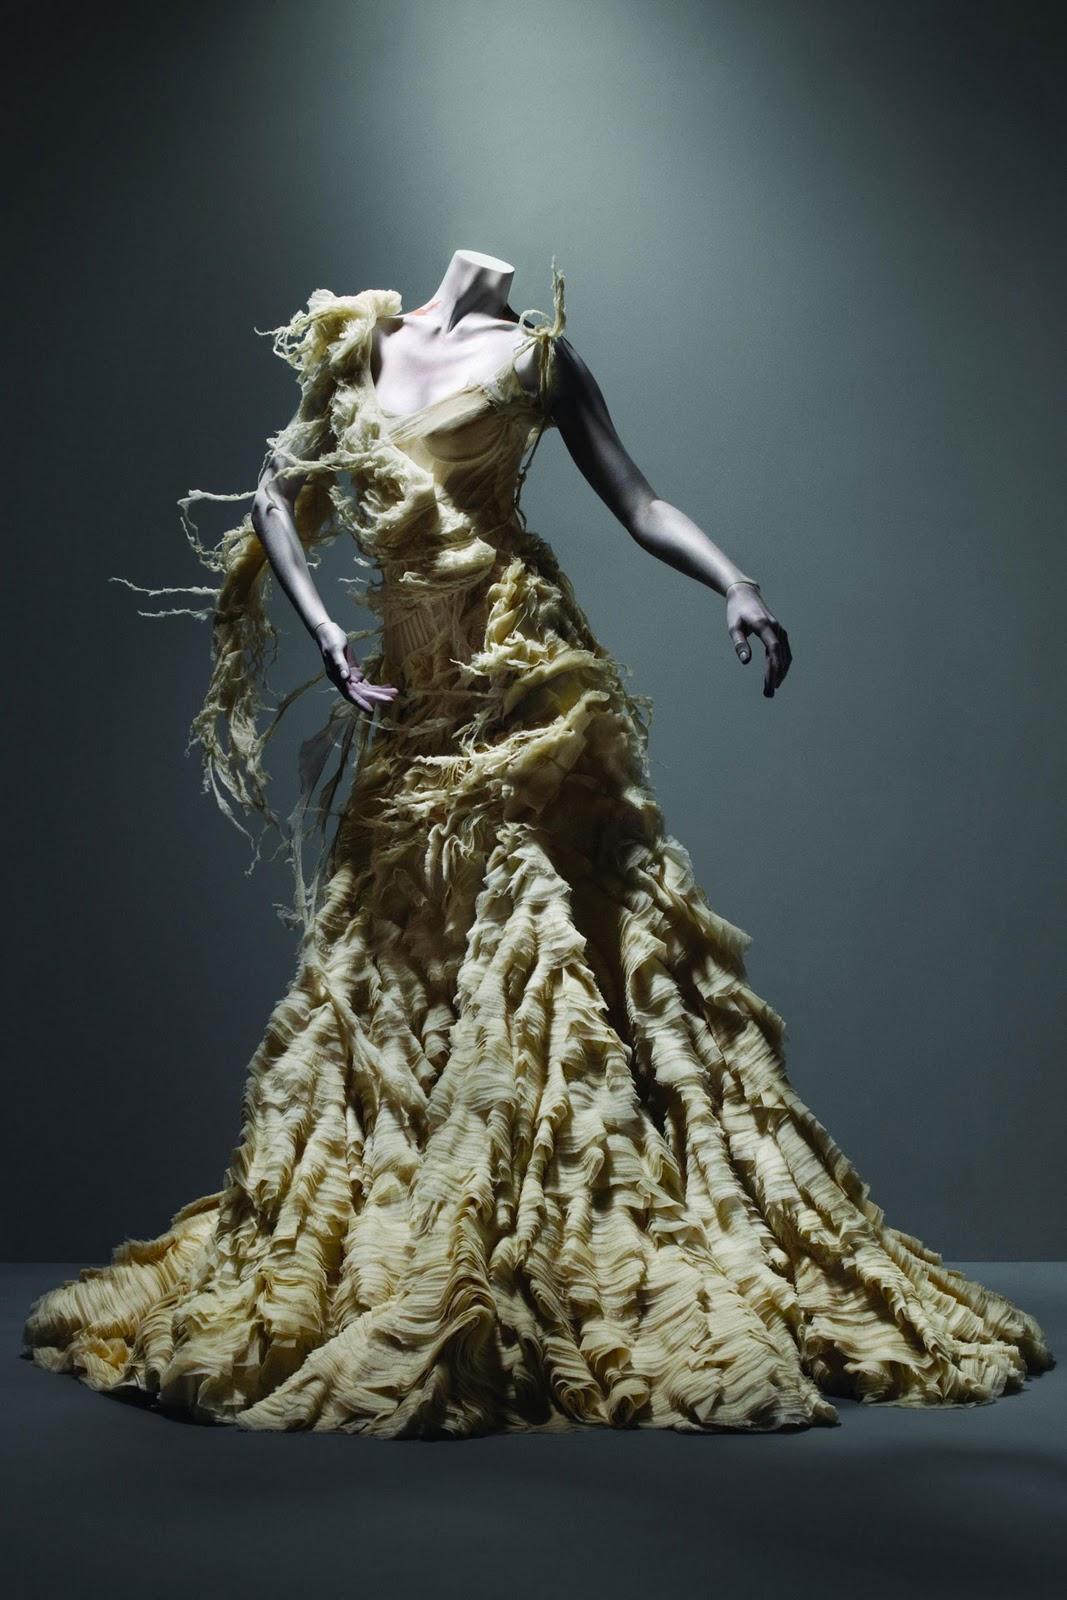 Alexander McQueen - Savage Beauty márciustól Londonban! - kiallitas, ujdonsagok, ajanlo -